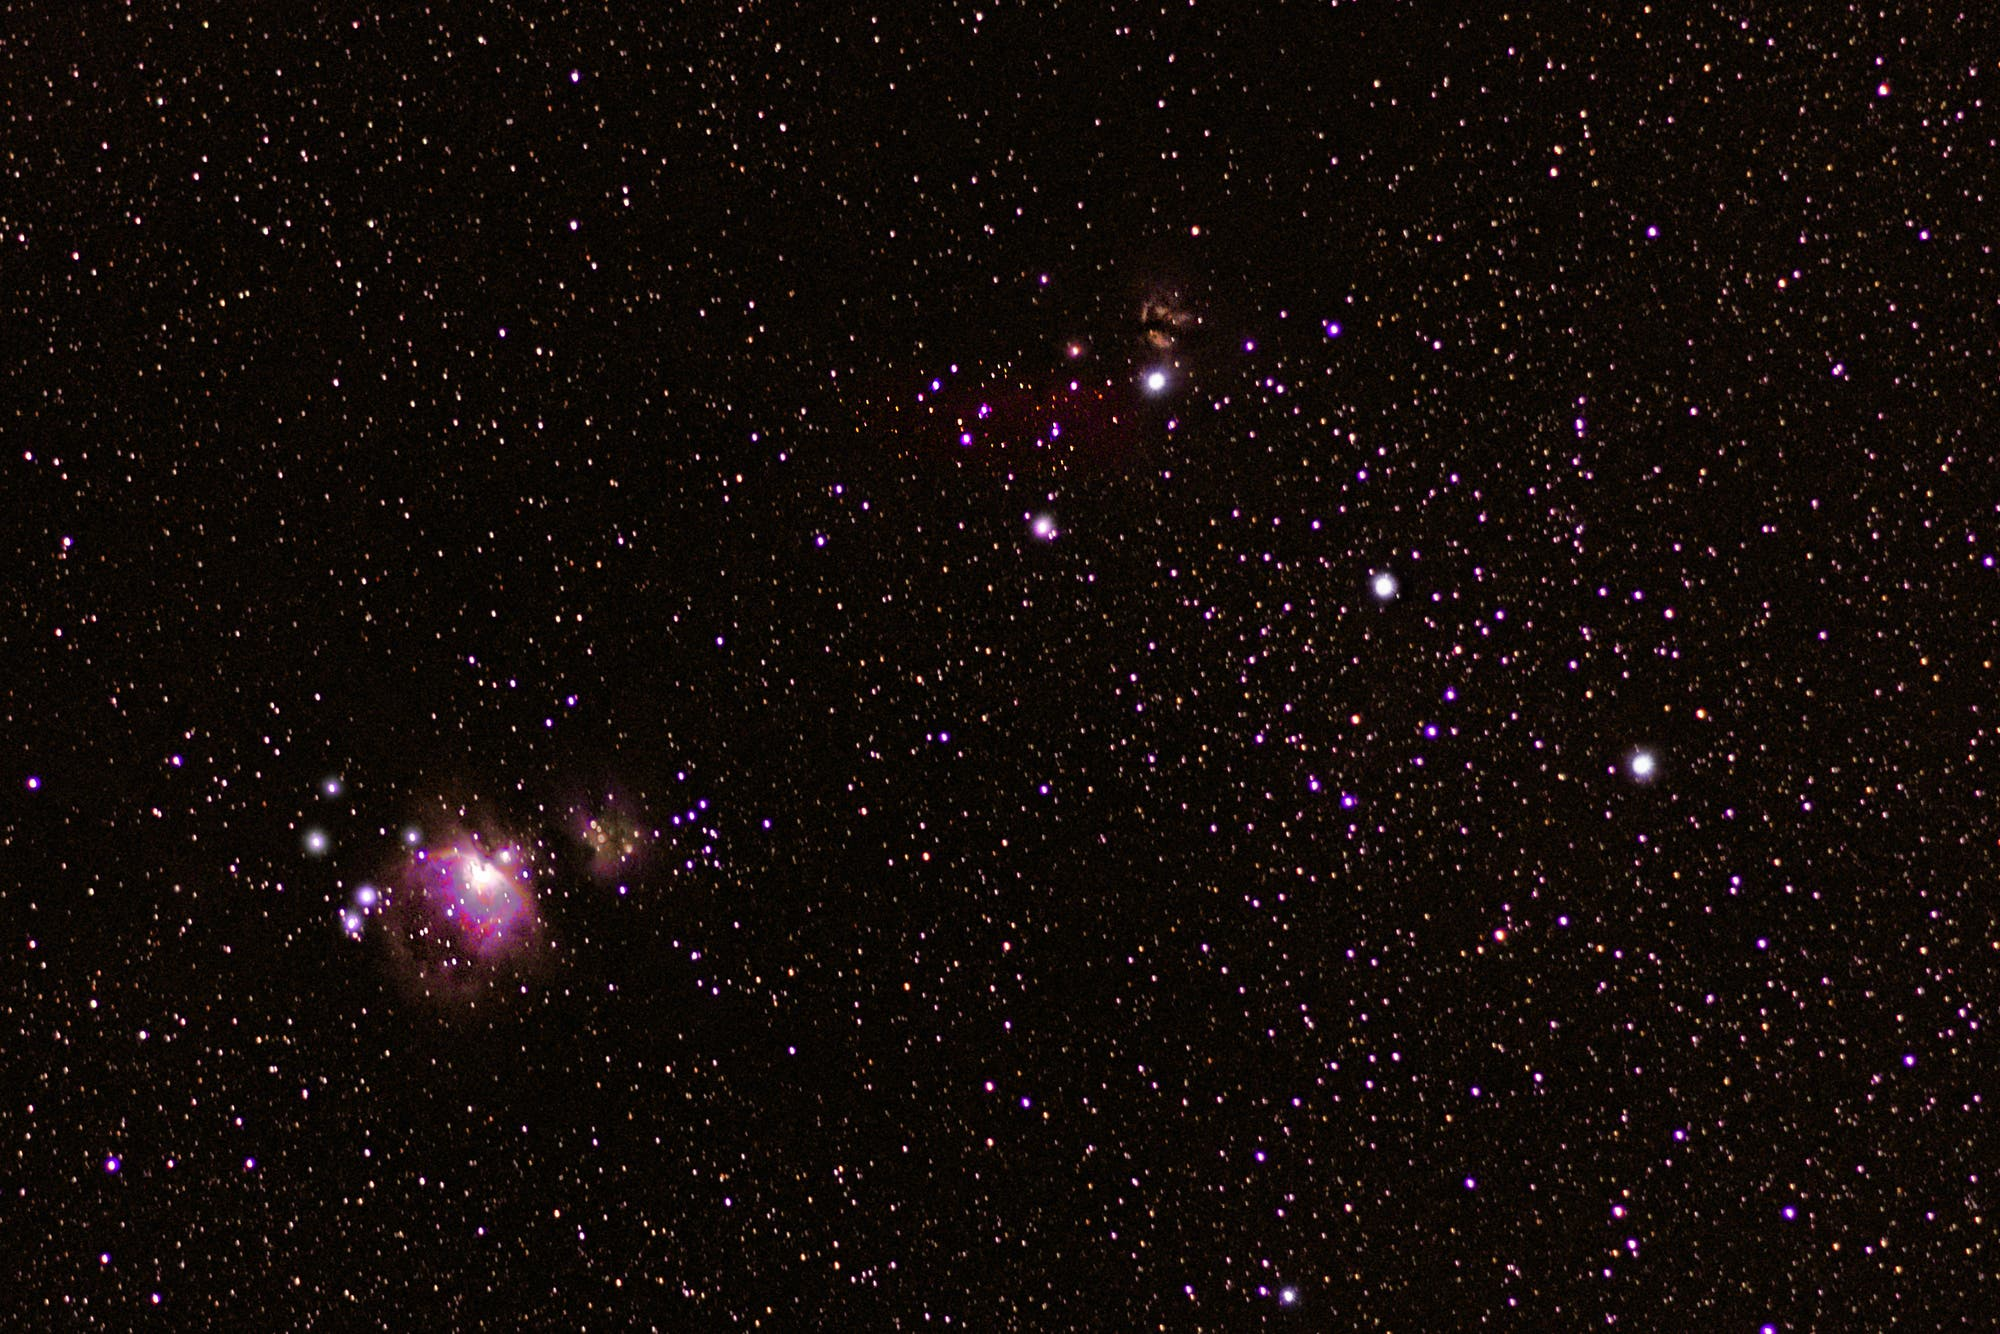 Emissionsnebel im Sternbild Orion